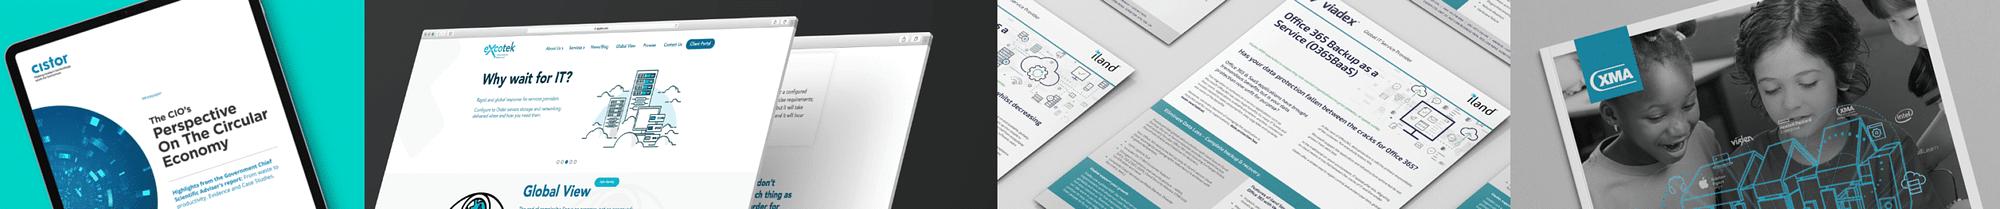 iPad-mtg-support-image-stripe4x